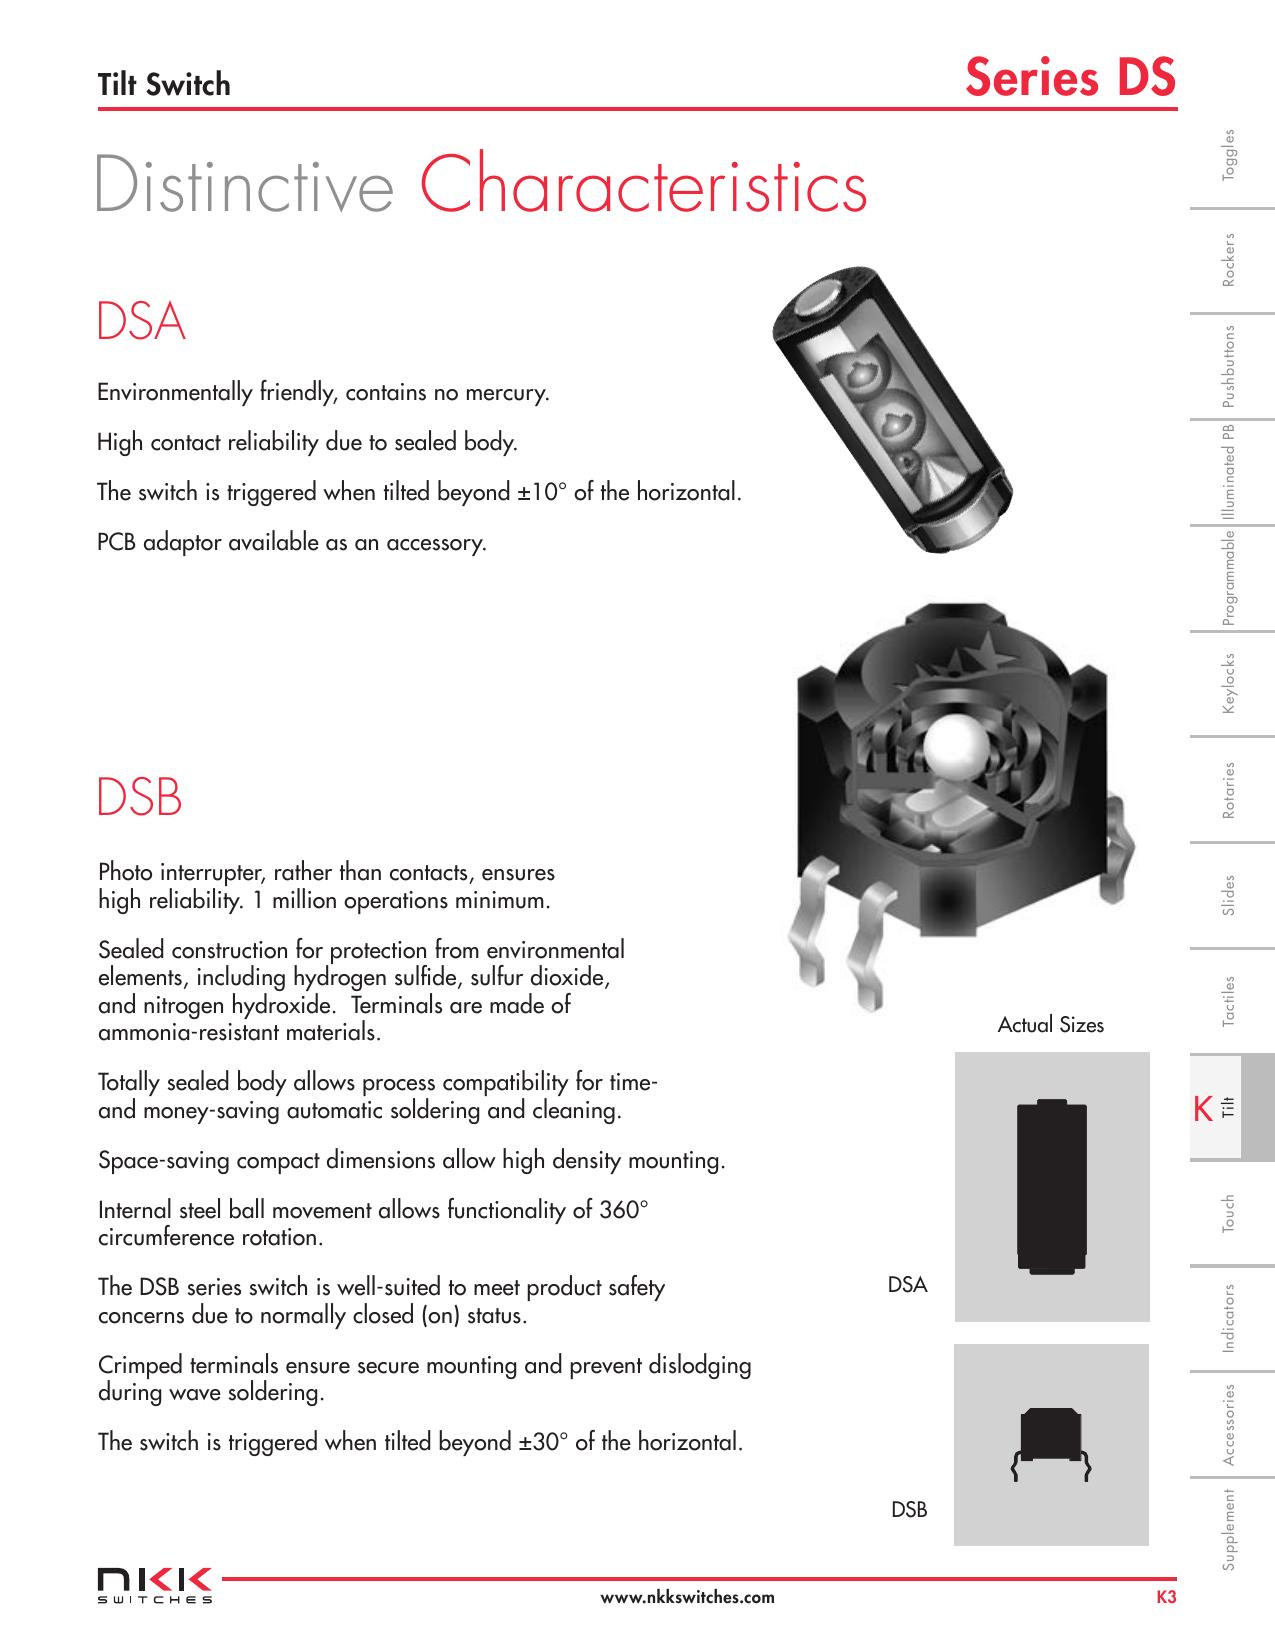 Tilt Switches (DS)